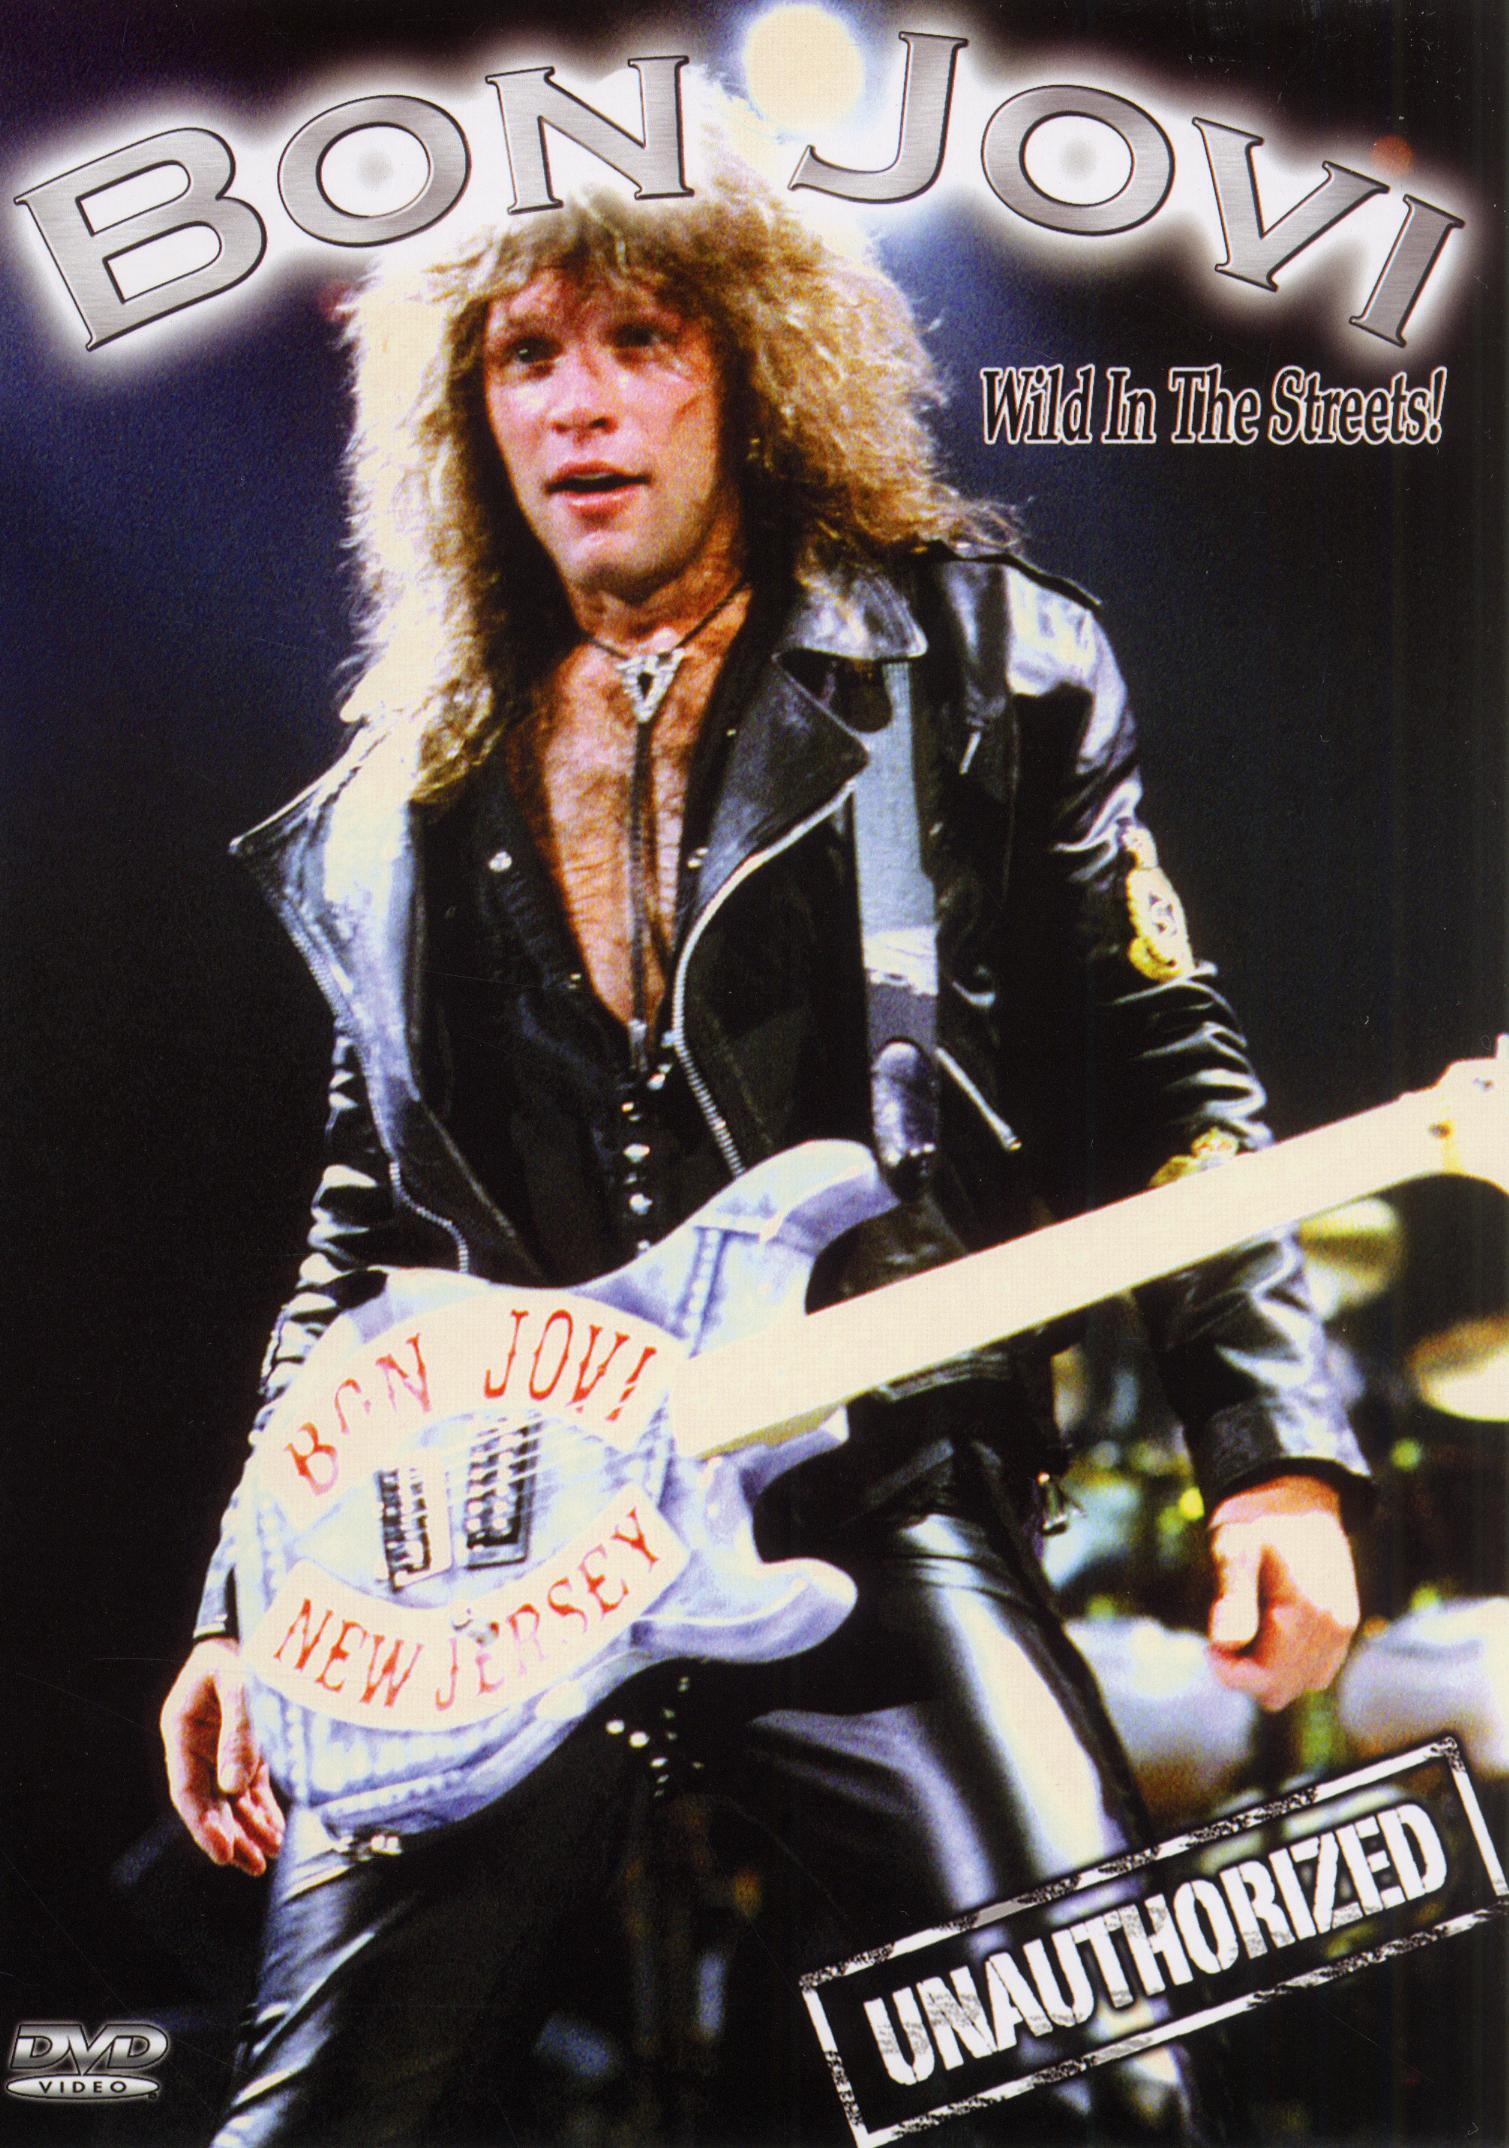 Bon Jovi: Wild in the Streets! Unauthorized